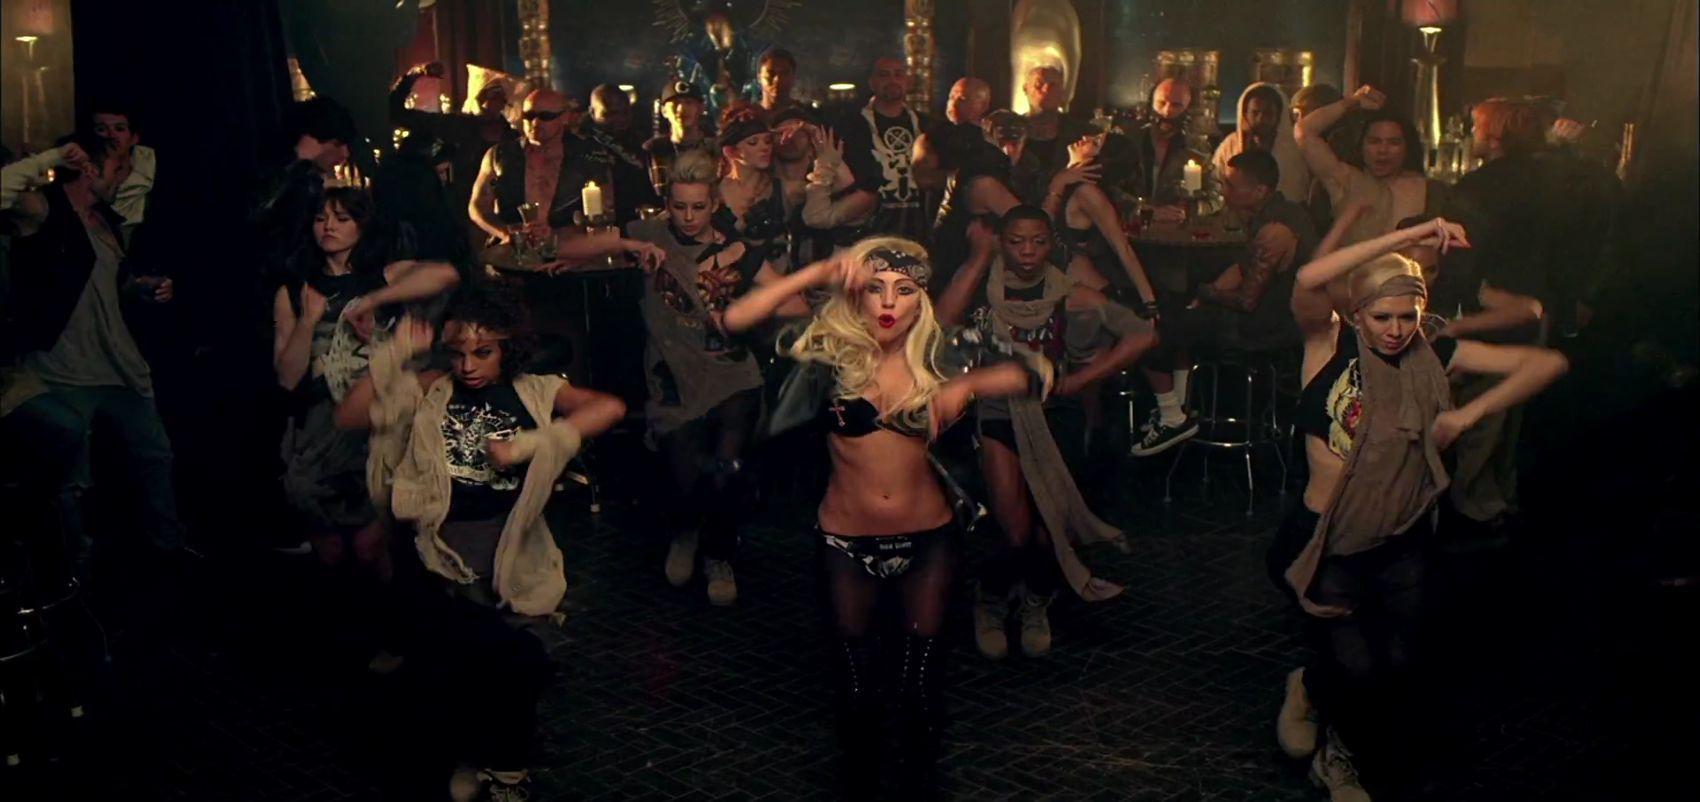 Lady Gaga - Judas - âm nhạc Video